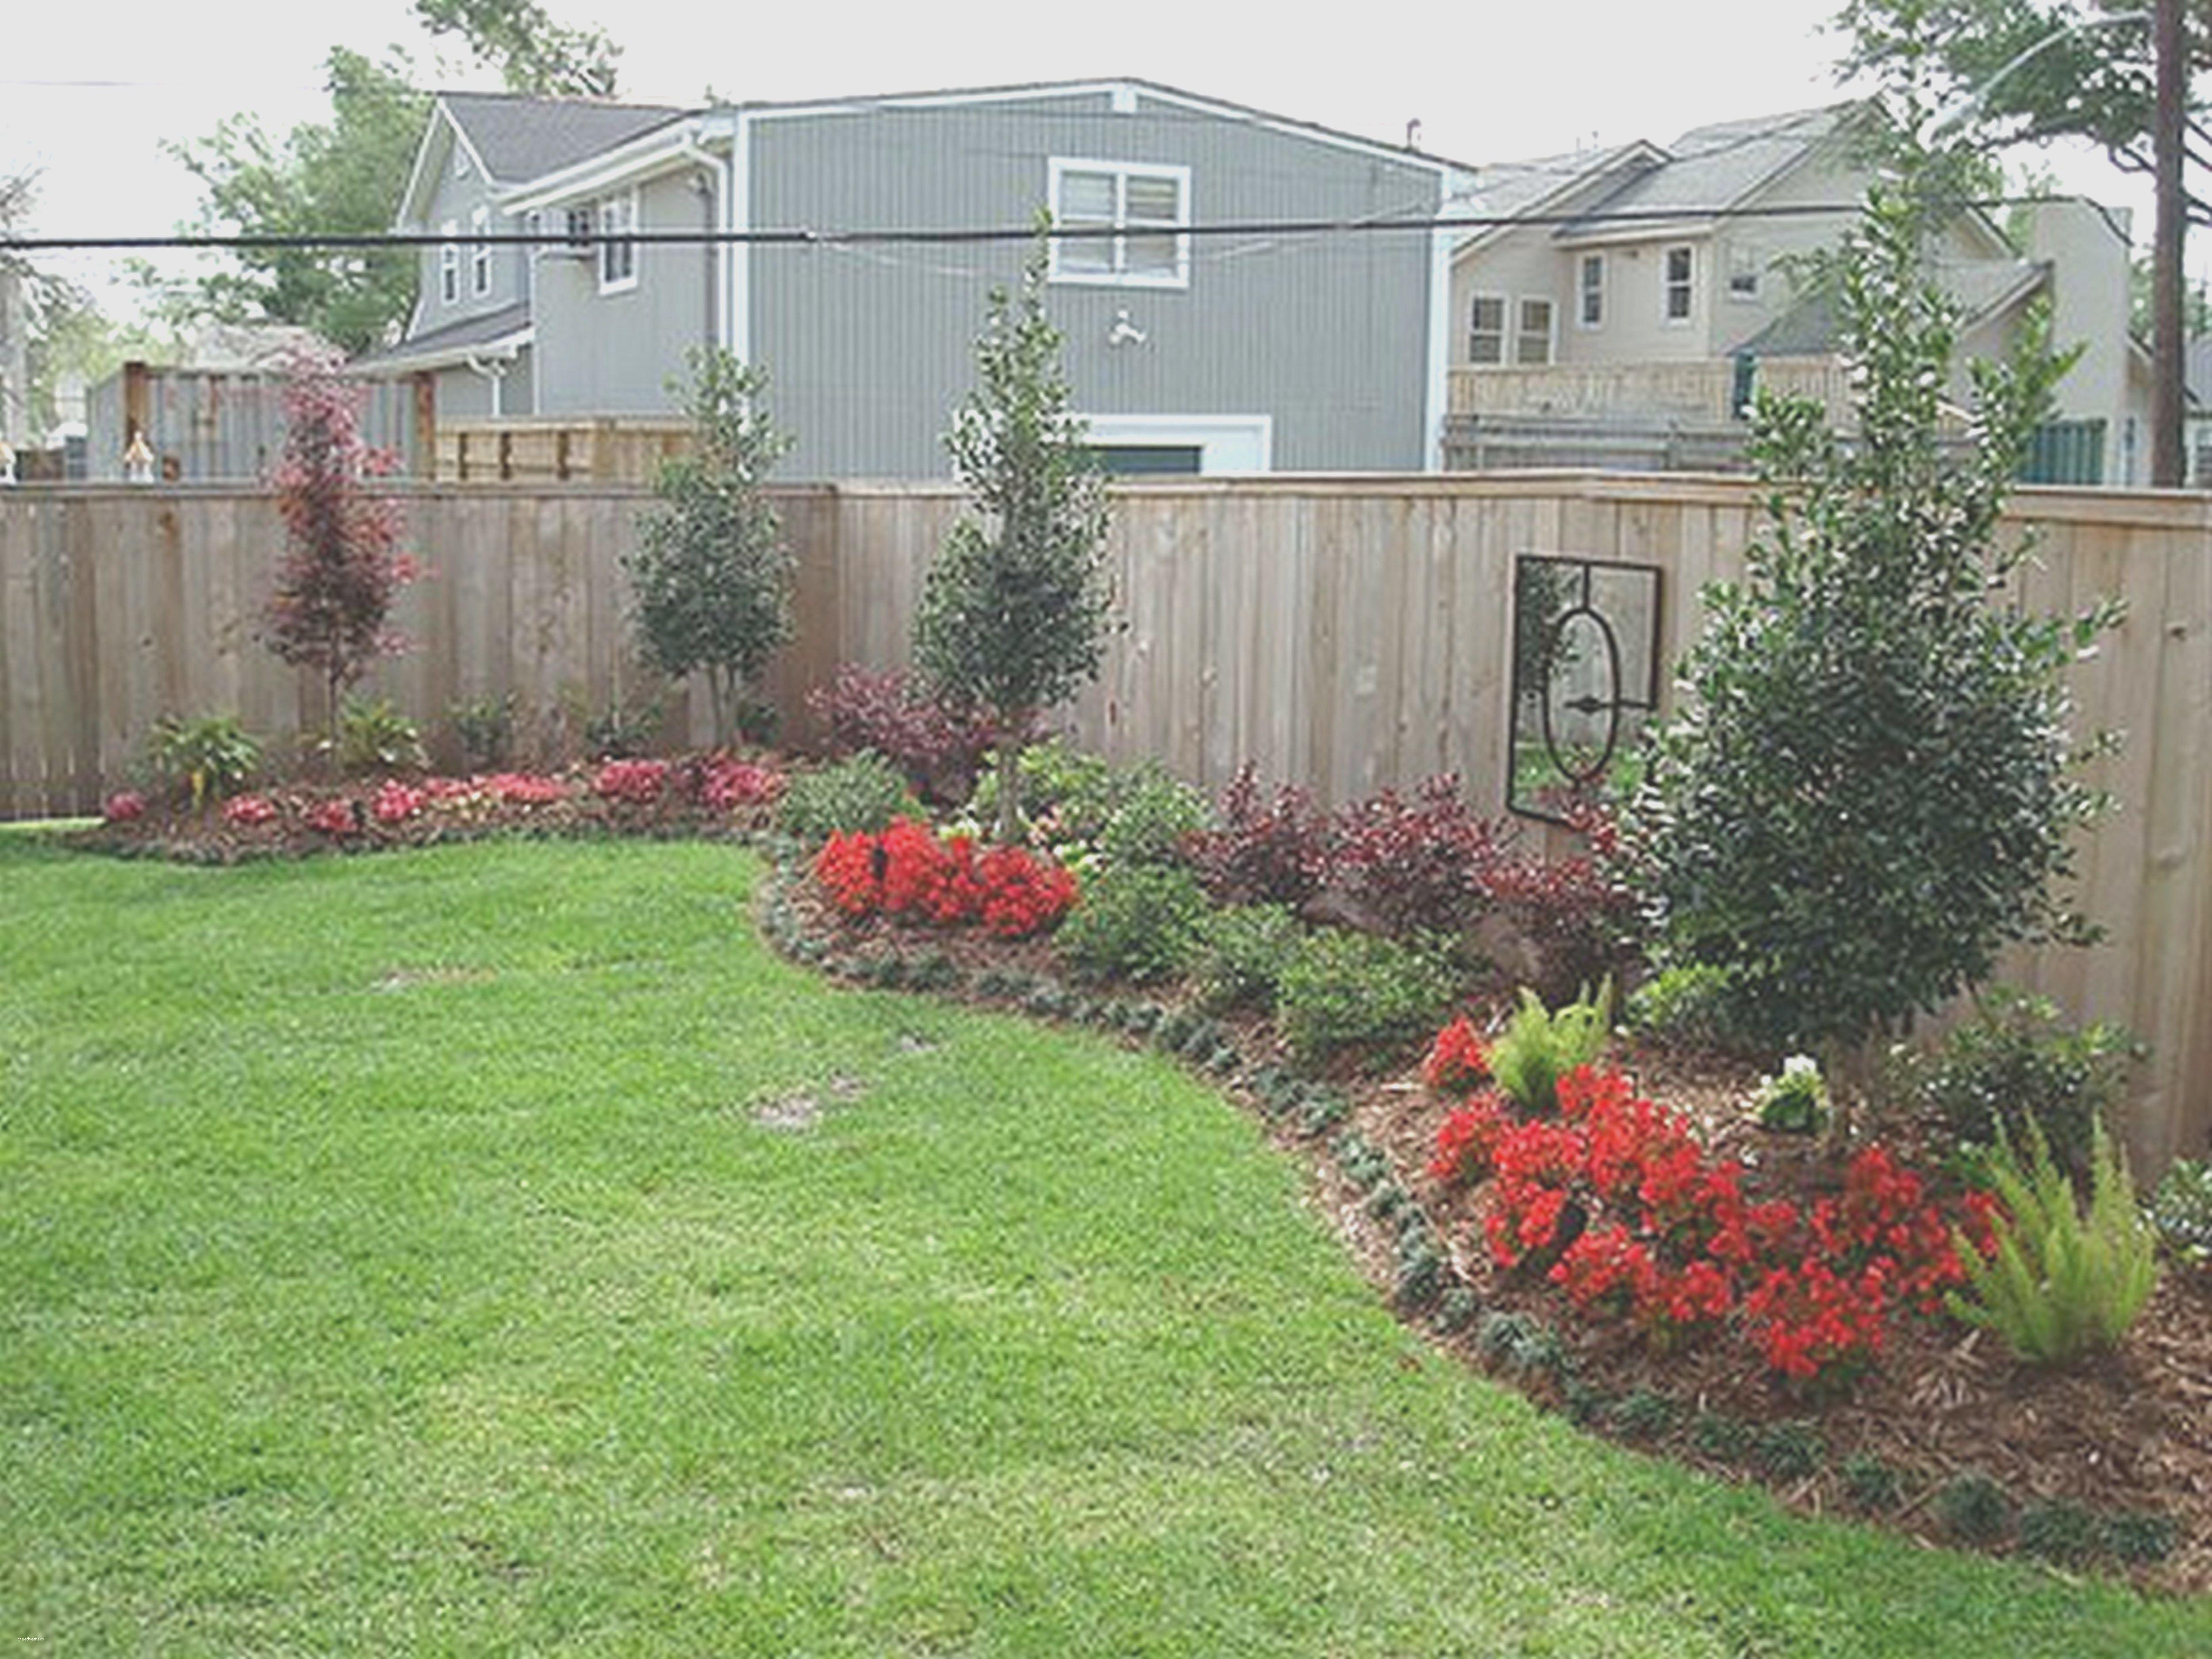 13 luxury italian garden design tuscan style landscaping along fencelandscaping ideasbackyard - Garden Ideas Along Fence